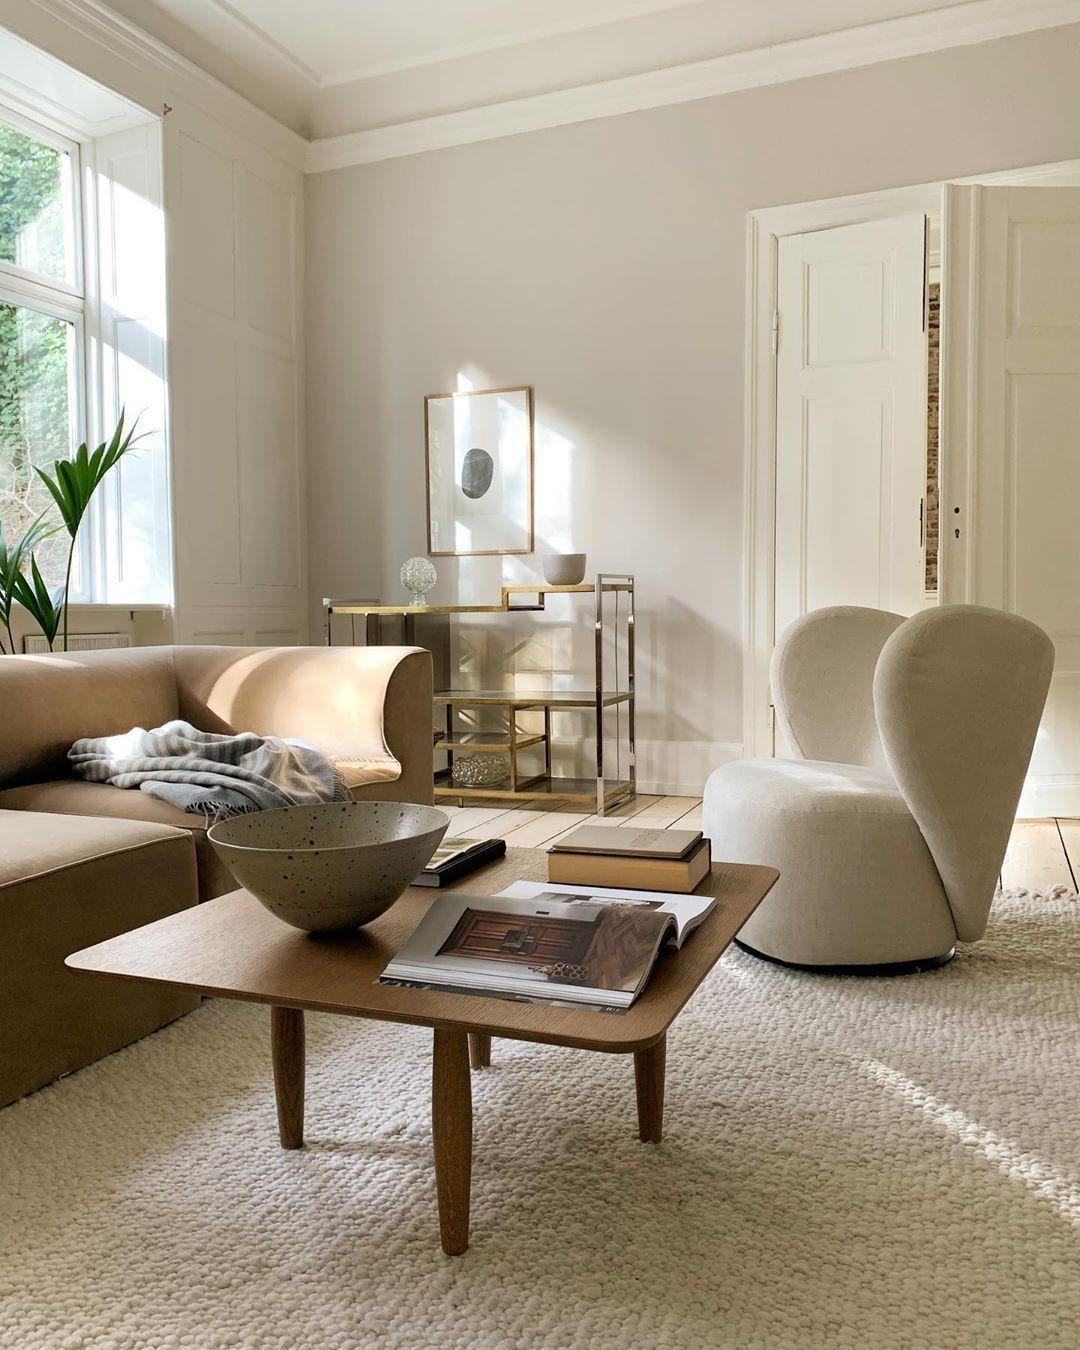 Home Decor Diy Home Decor Diy Decor Home Living Room Home Living Room Interior Inspiration best living room